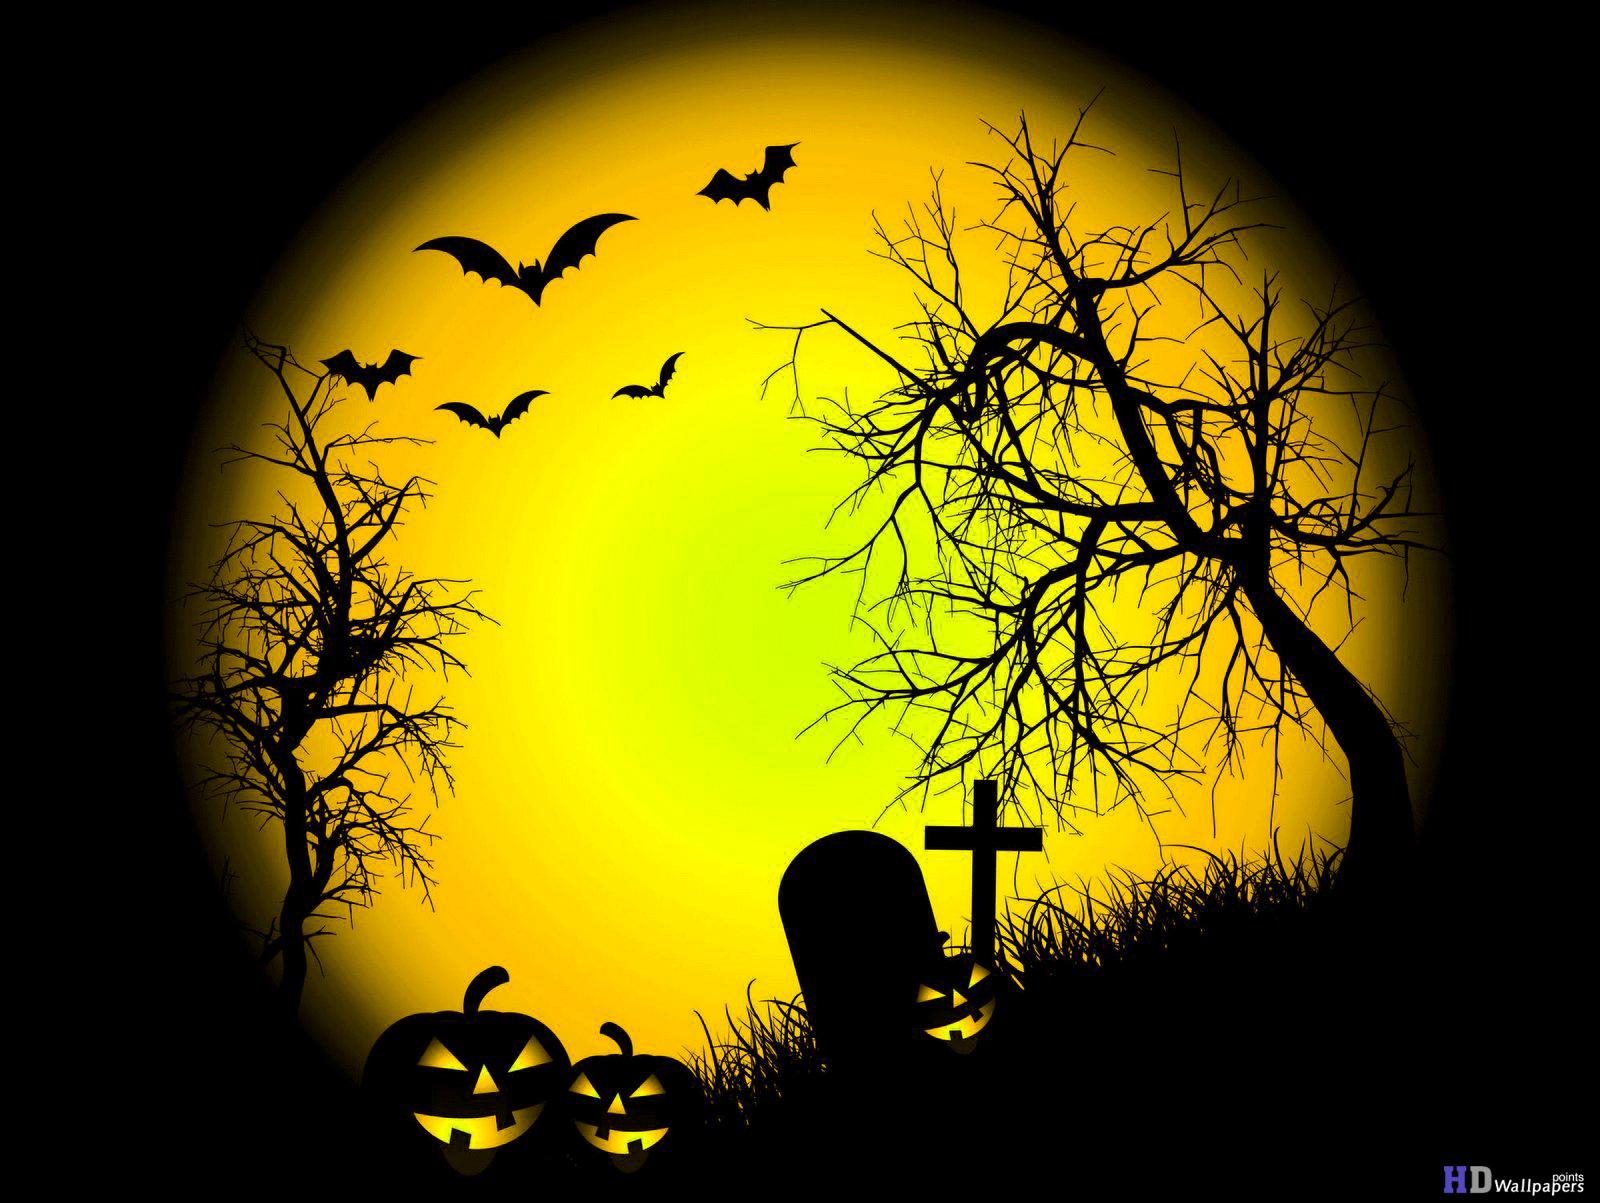 Halloween Desktop Background HD Wallpaper 1600x1203